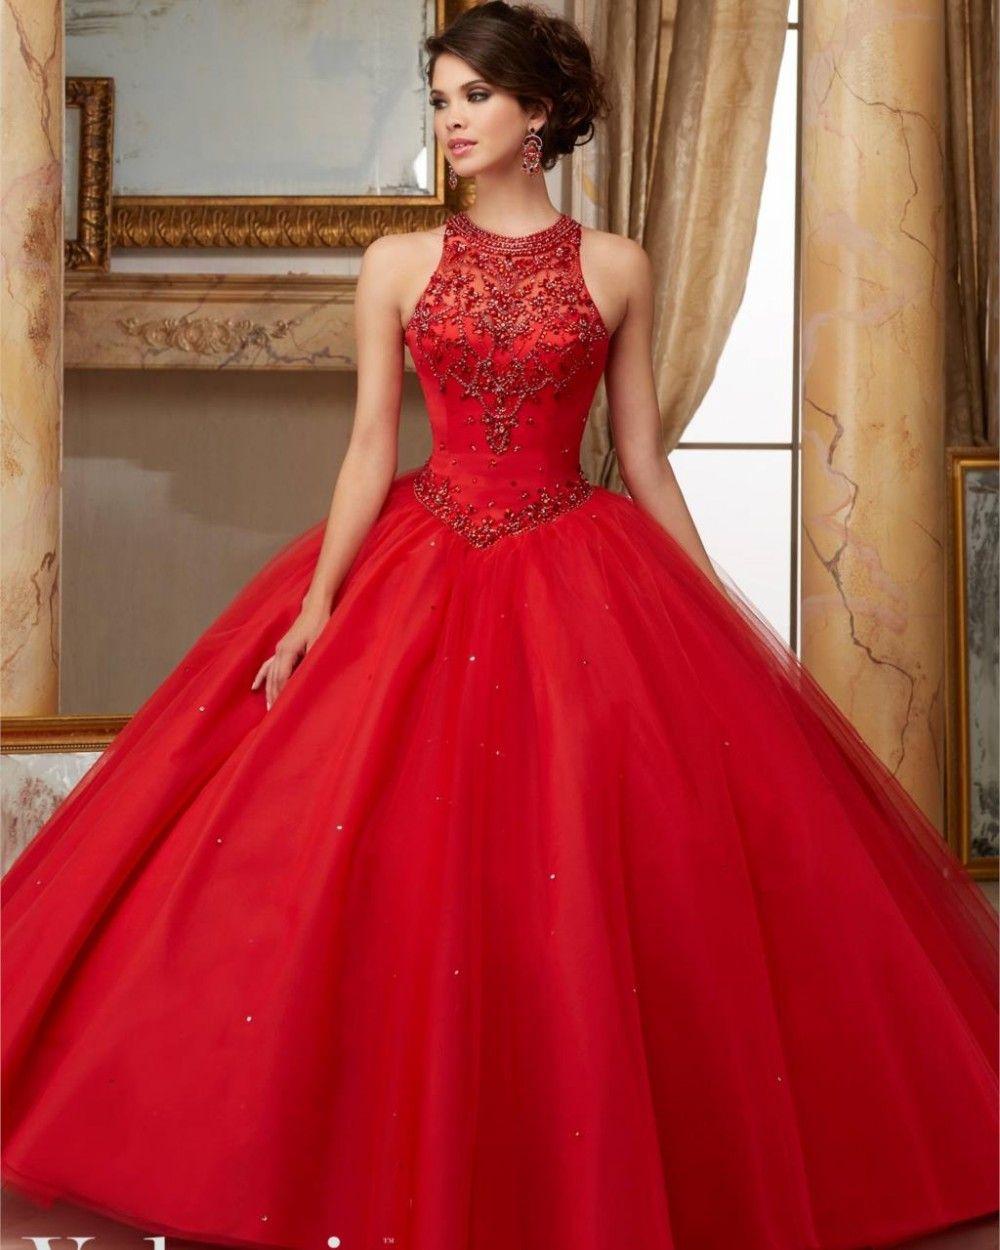 Scarlet-Red-Corset-font-b-Quinceanera-b-font-font-b-Dress-b-font ...